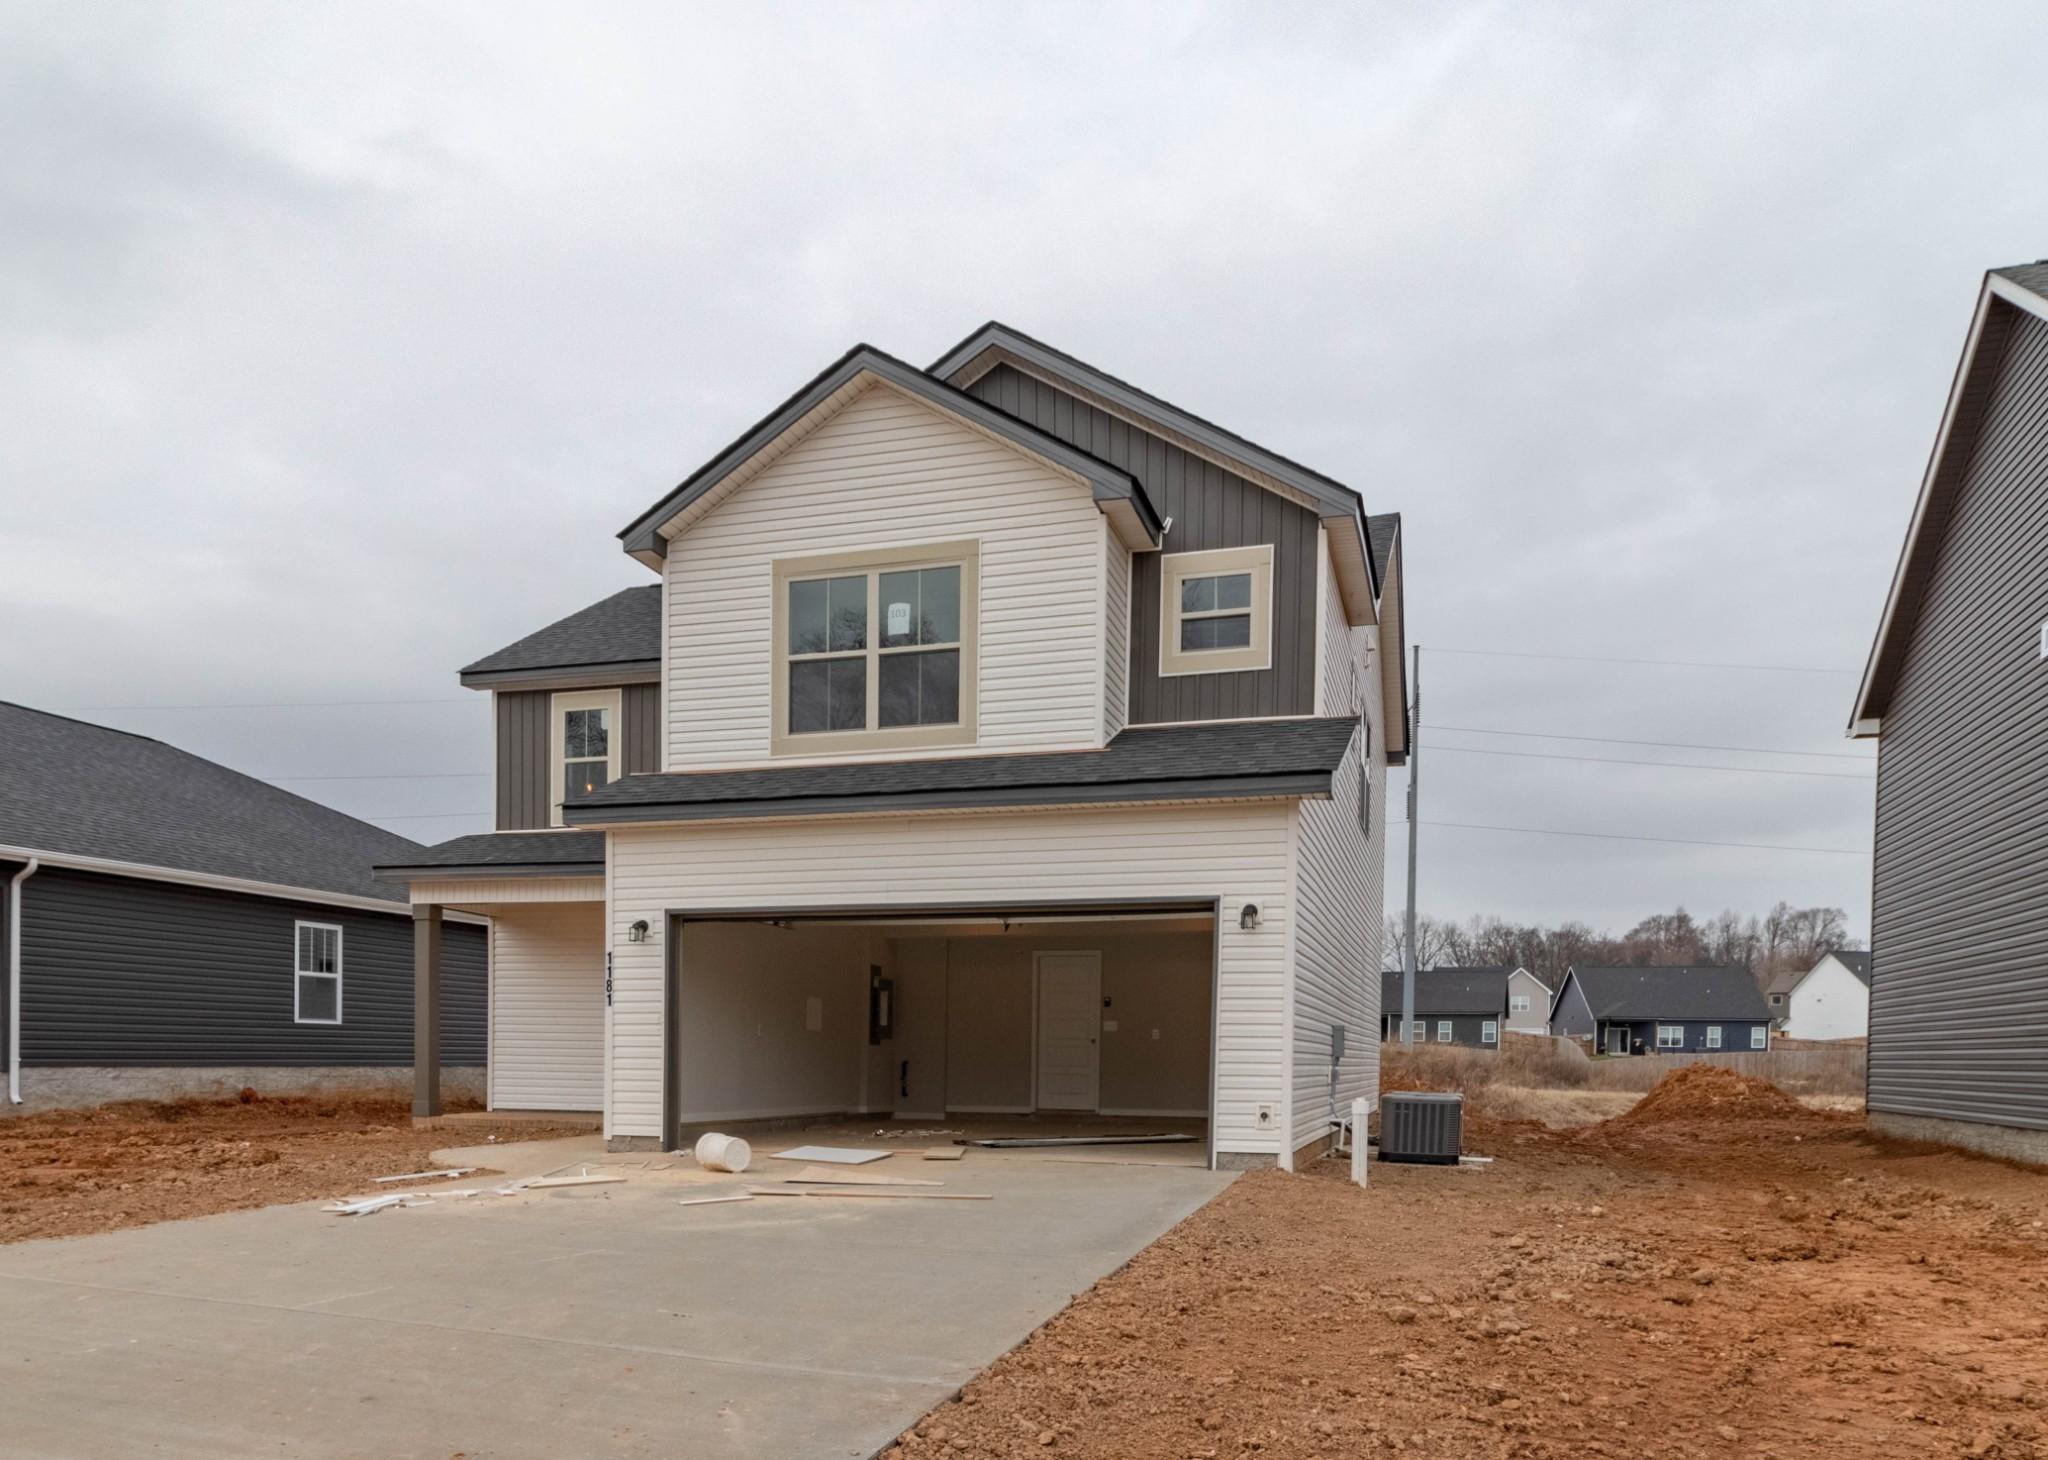 103 Eagles Bluff, Clarksville, TN 37040 - Clarksville, TN real estate listing